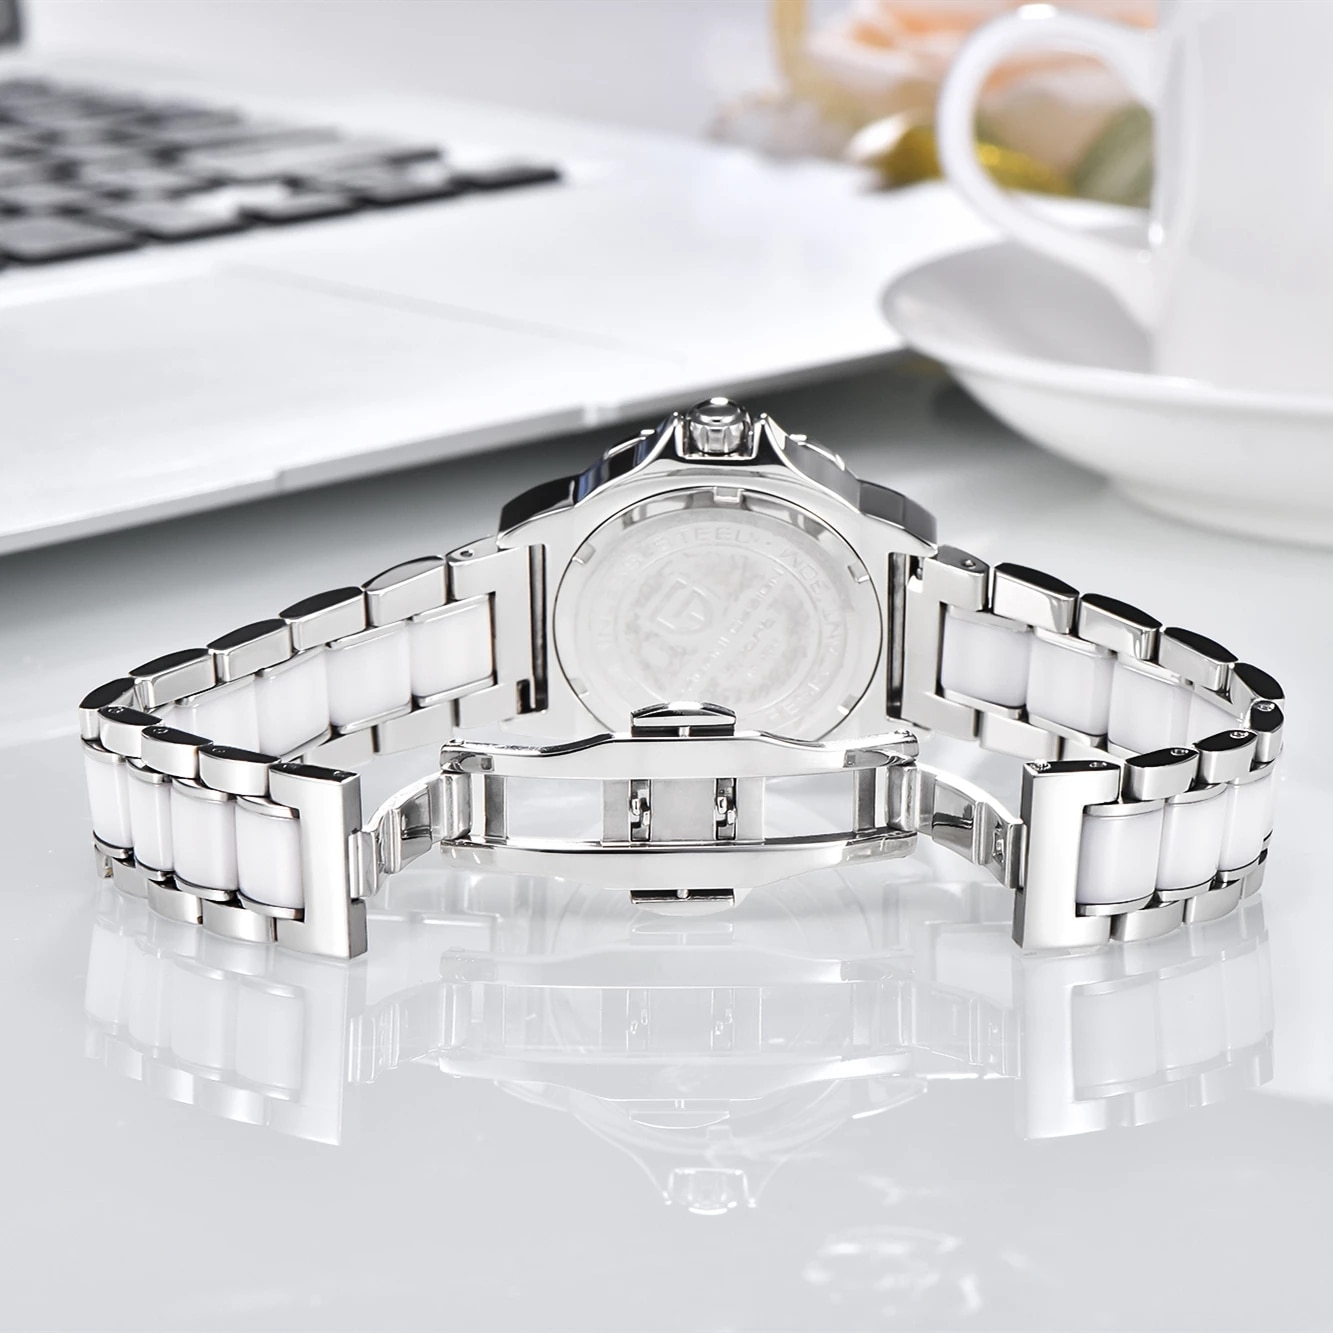 PAGANI DESIGN Women's Watches High Quality Ceramic Bracelet Women Watch Famous Luxury Brand Fashion Sport Clock Relogio Feminino enlarge